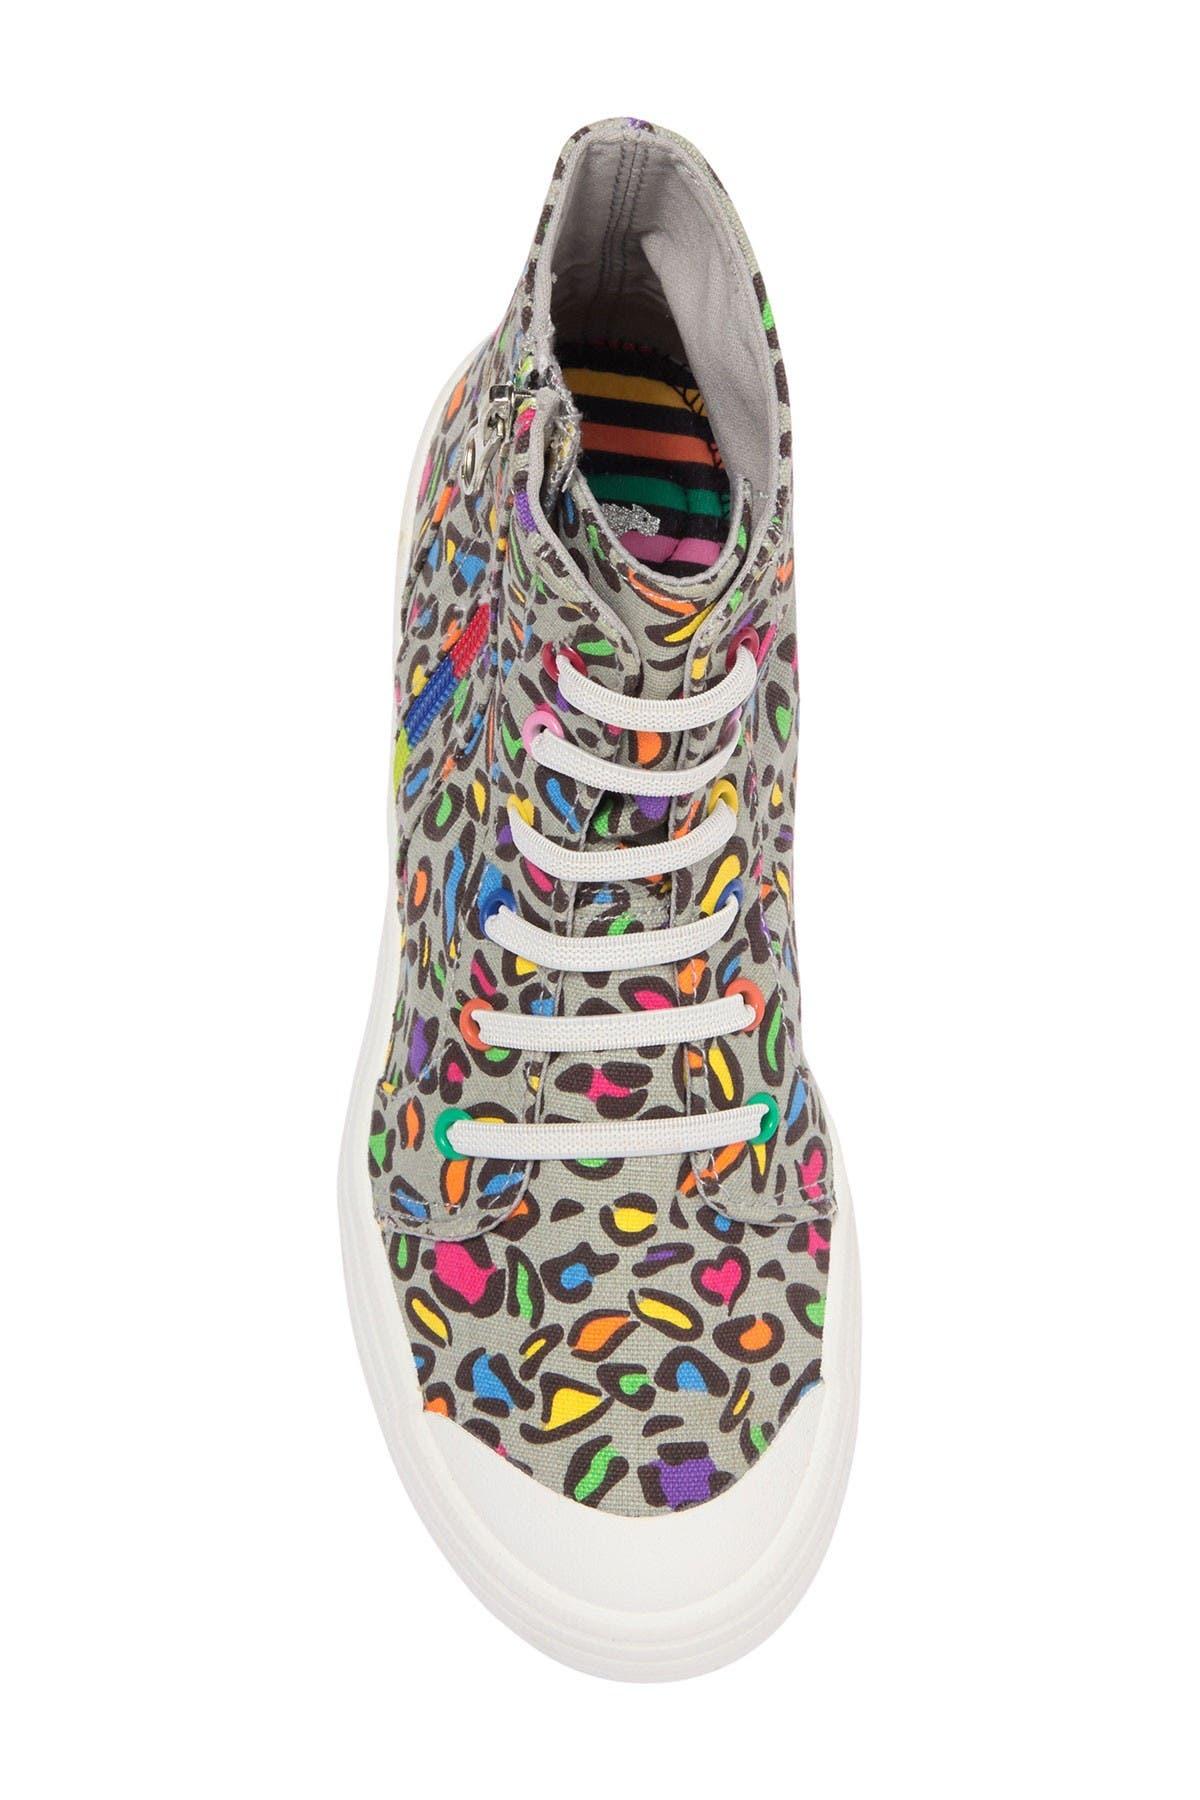 Rocket Dog Cayla Lisa Leopard High Top Sneaker